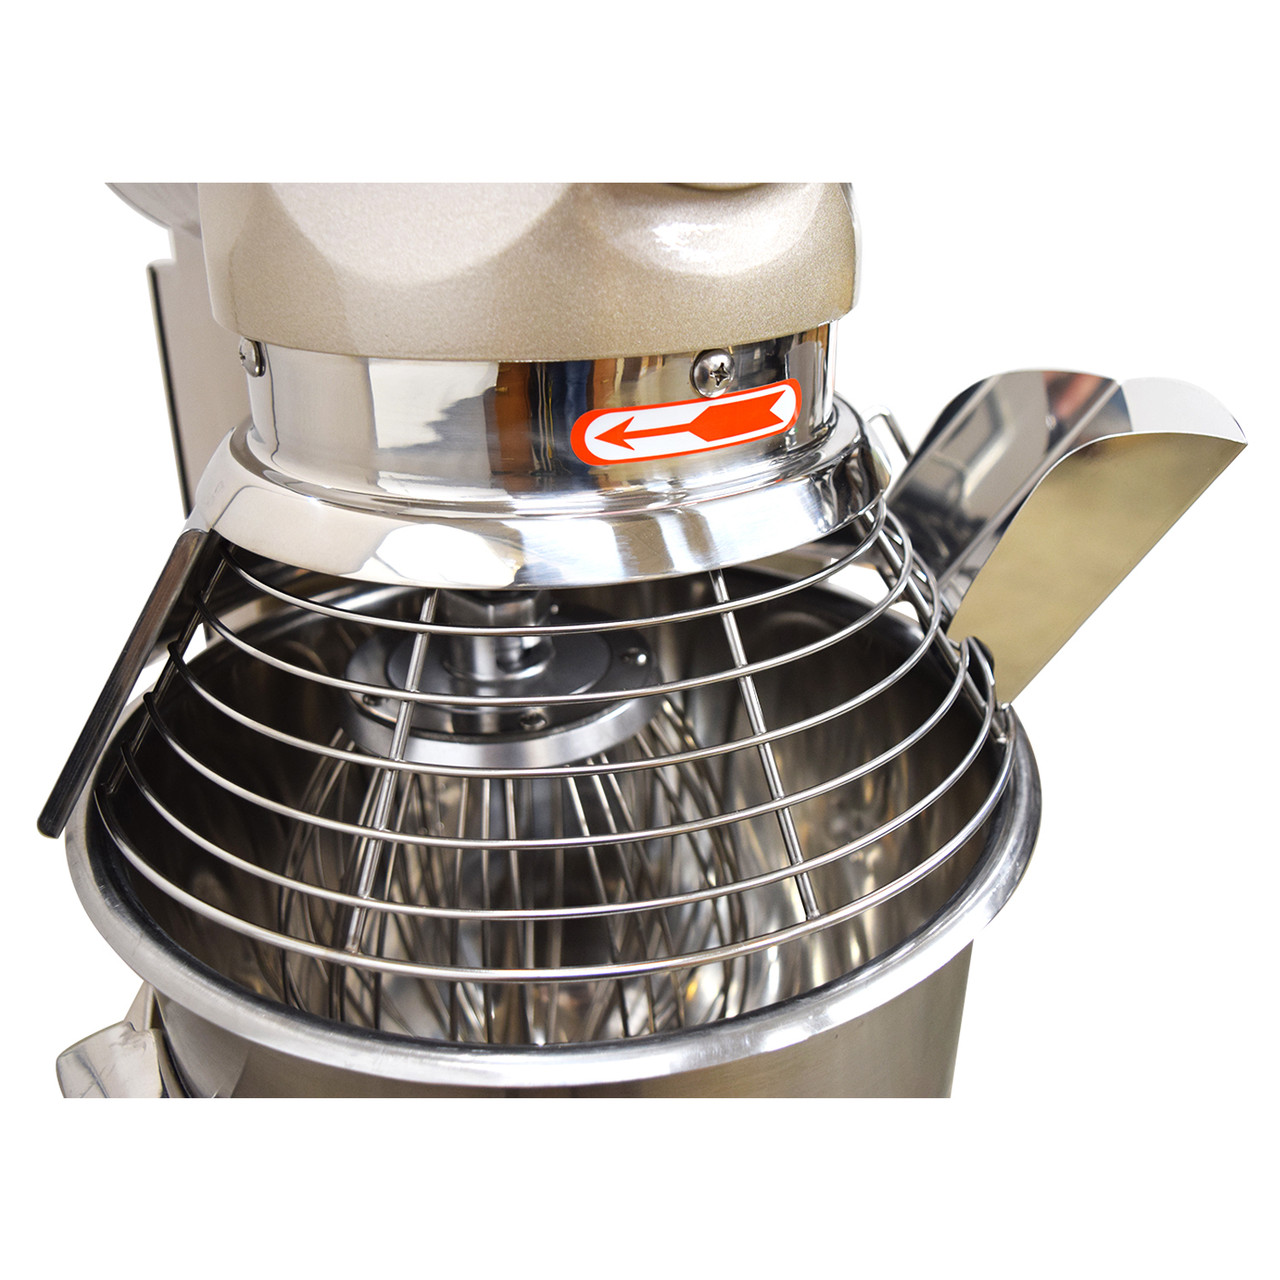 AE-20GA 20 Quart Commercial Planetary Mixer Feeder Chute - Pour Ingredients While Mixing